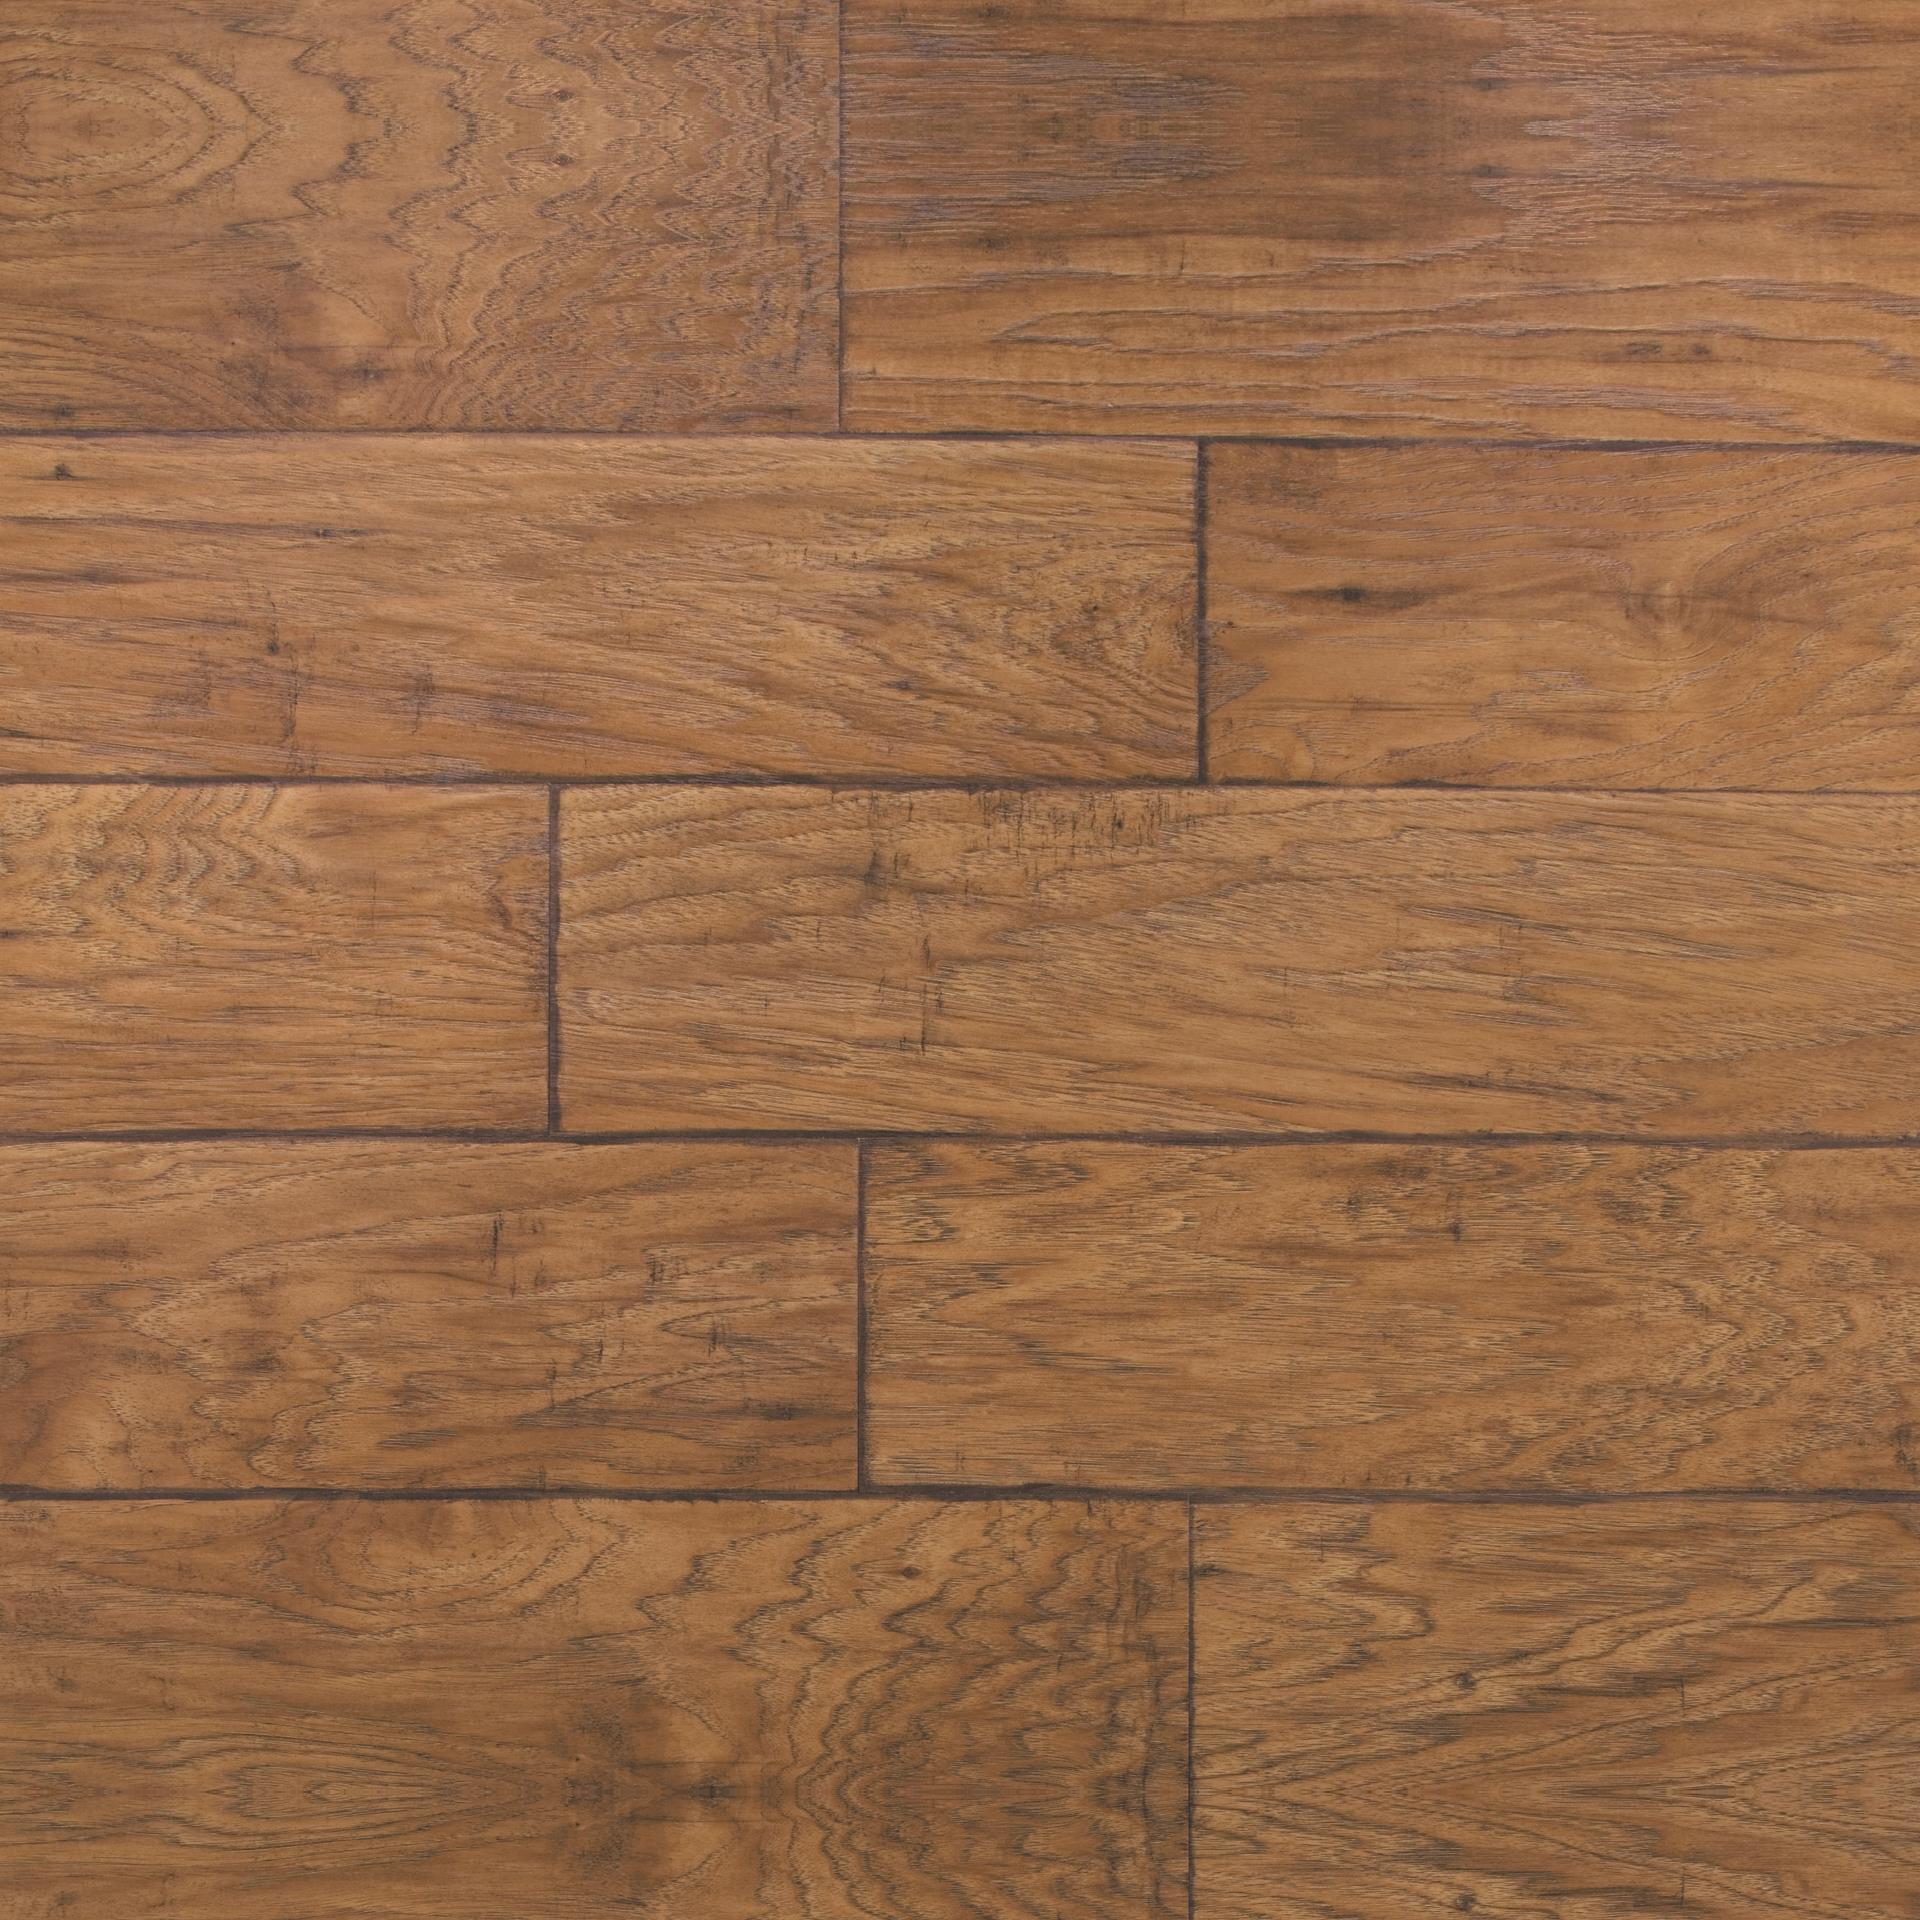 Quickstep Rustic Hickory Buy Laminate Flooring Online